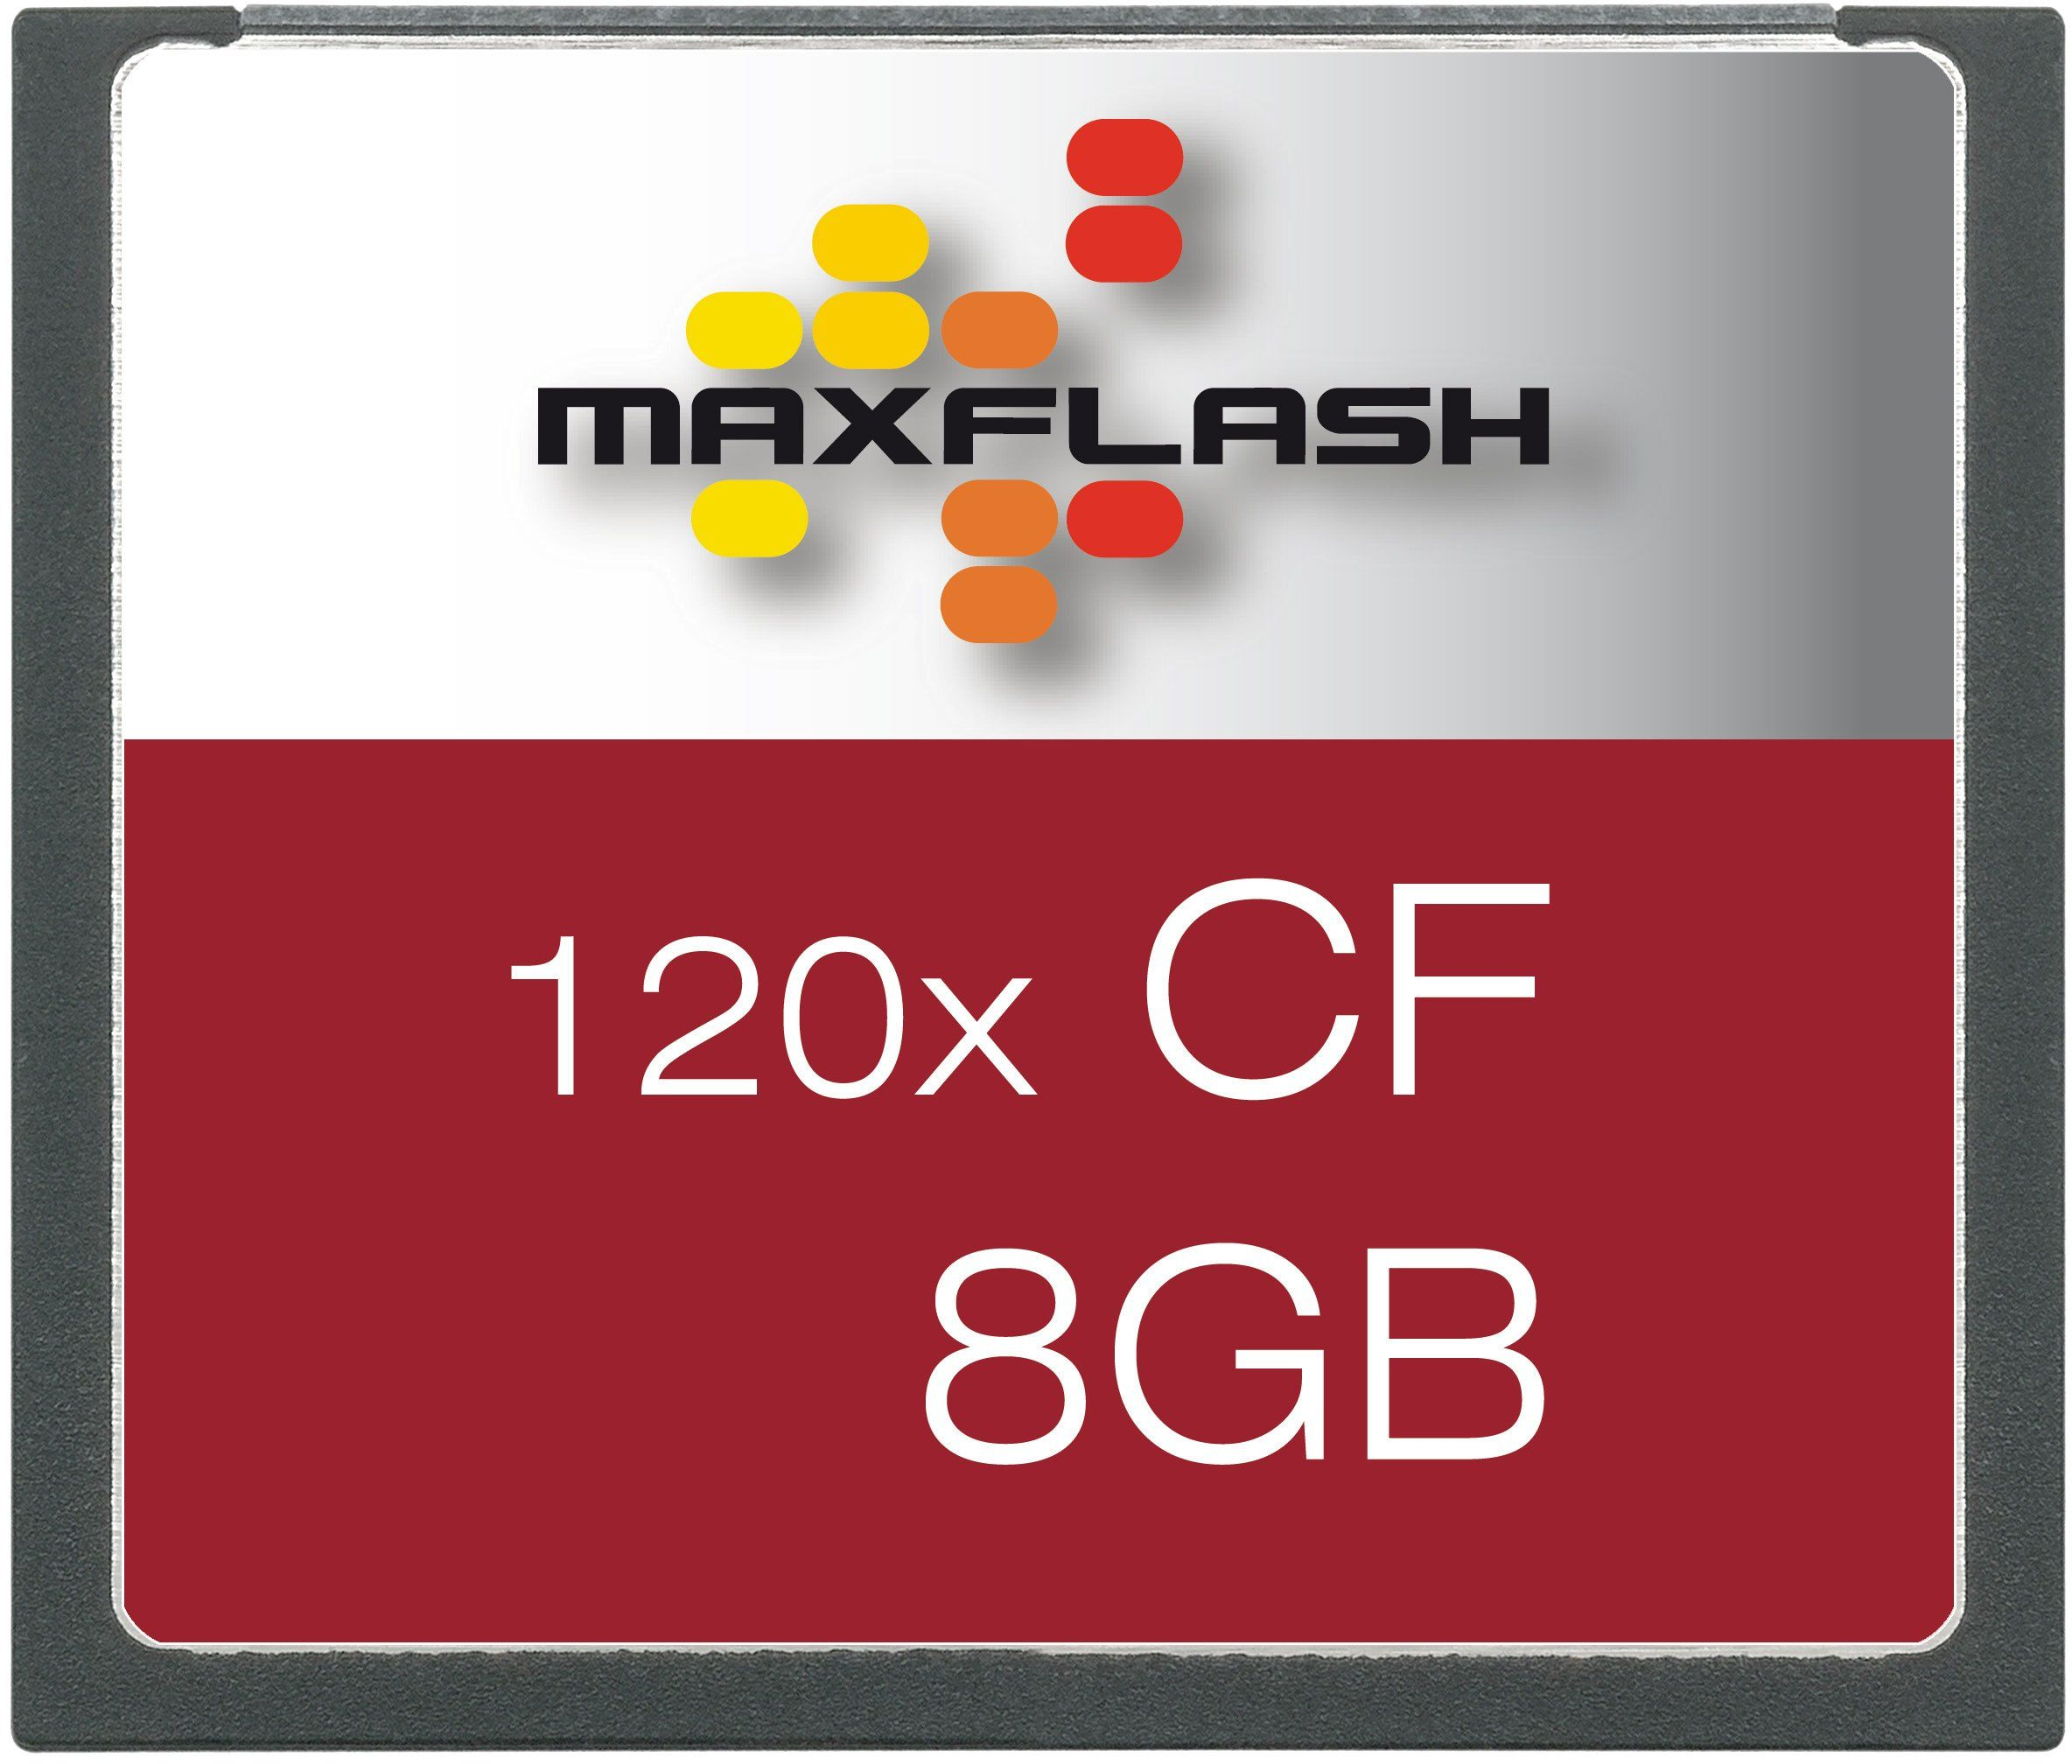 Maxflash Karta pamięci Compact Flash (CF) 8 GB (oryginalne opakowanie handlowe)